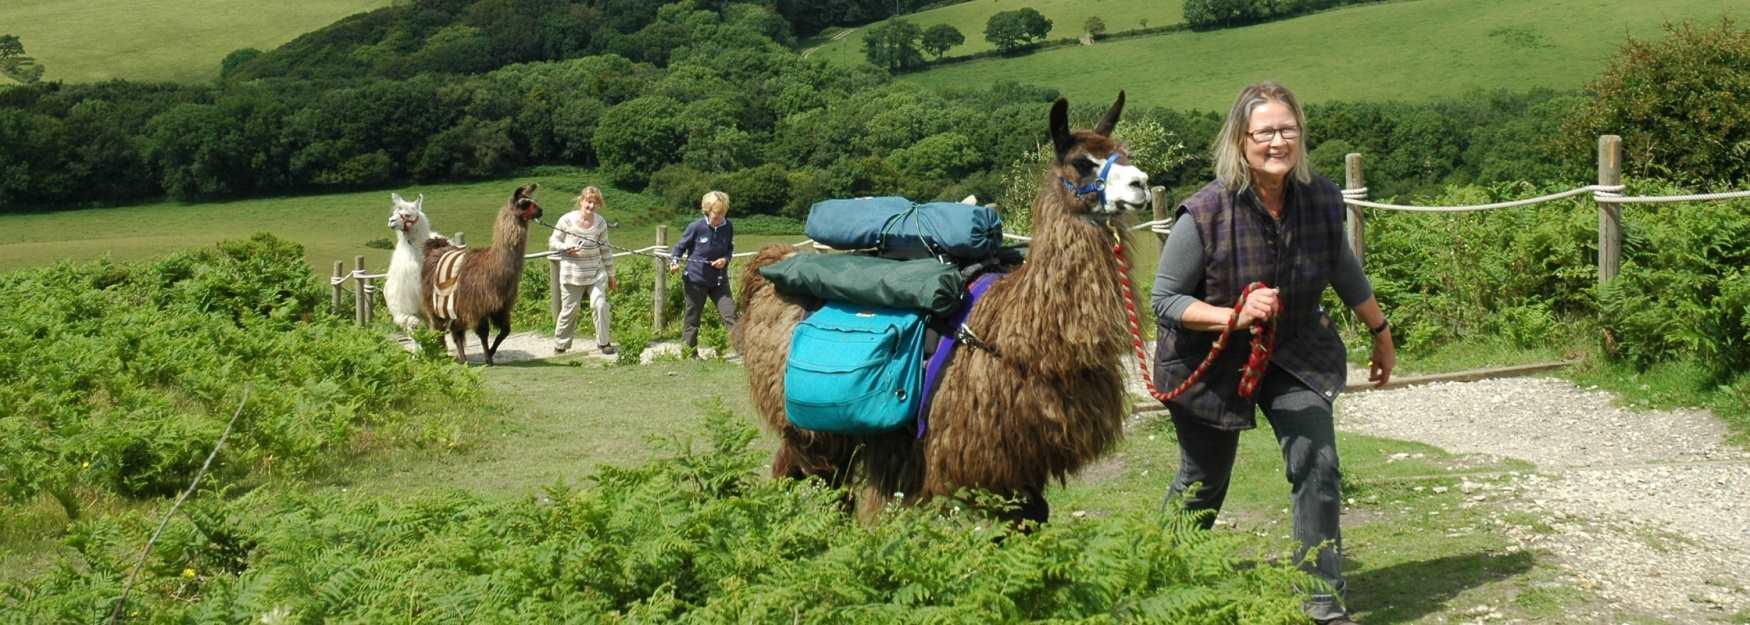 Trek through the beautiful West Dorset countryside with a Llama